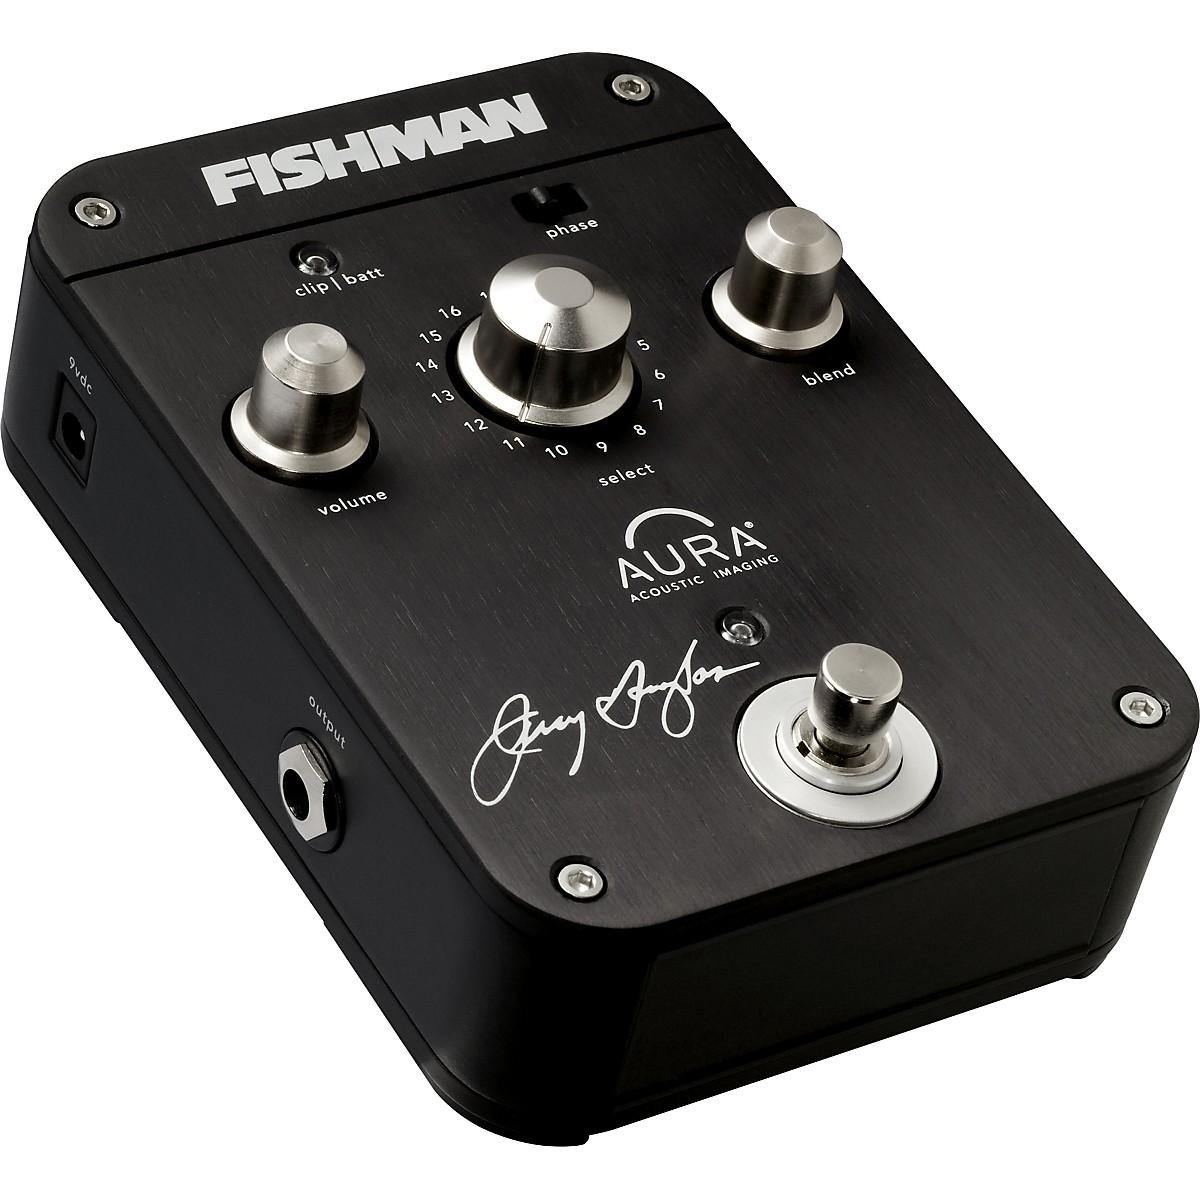 Fishman Jerry Douglas Signature Aura Imaging Effects Pedal for Resonator Guitar